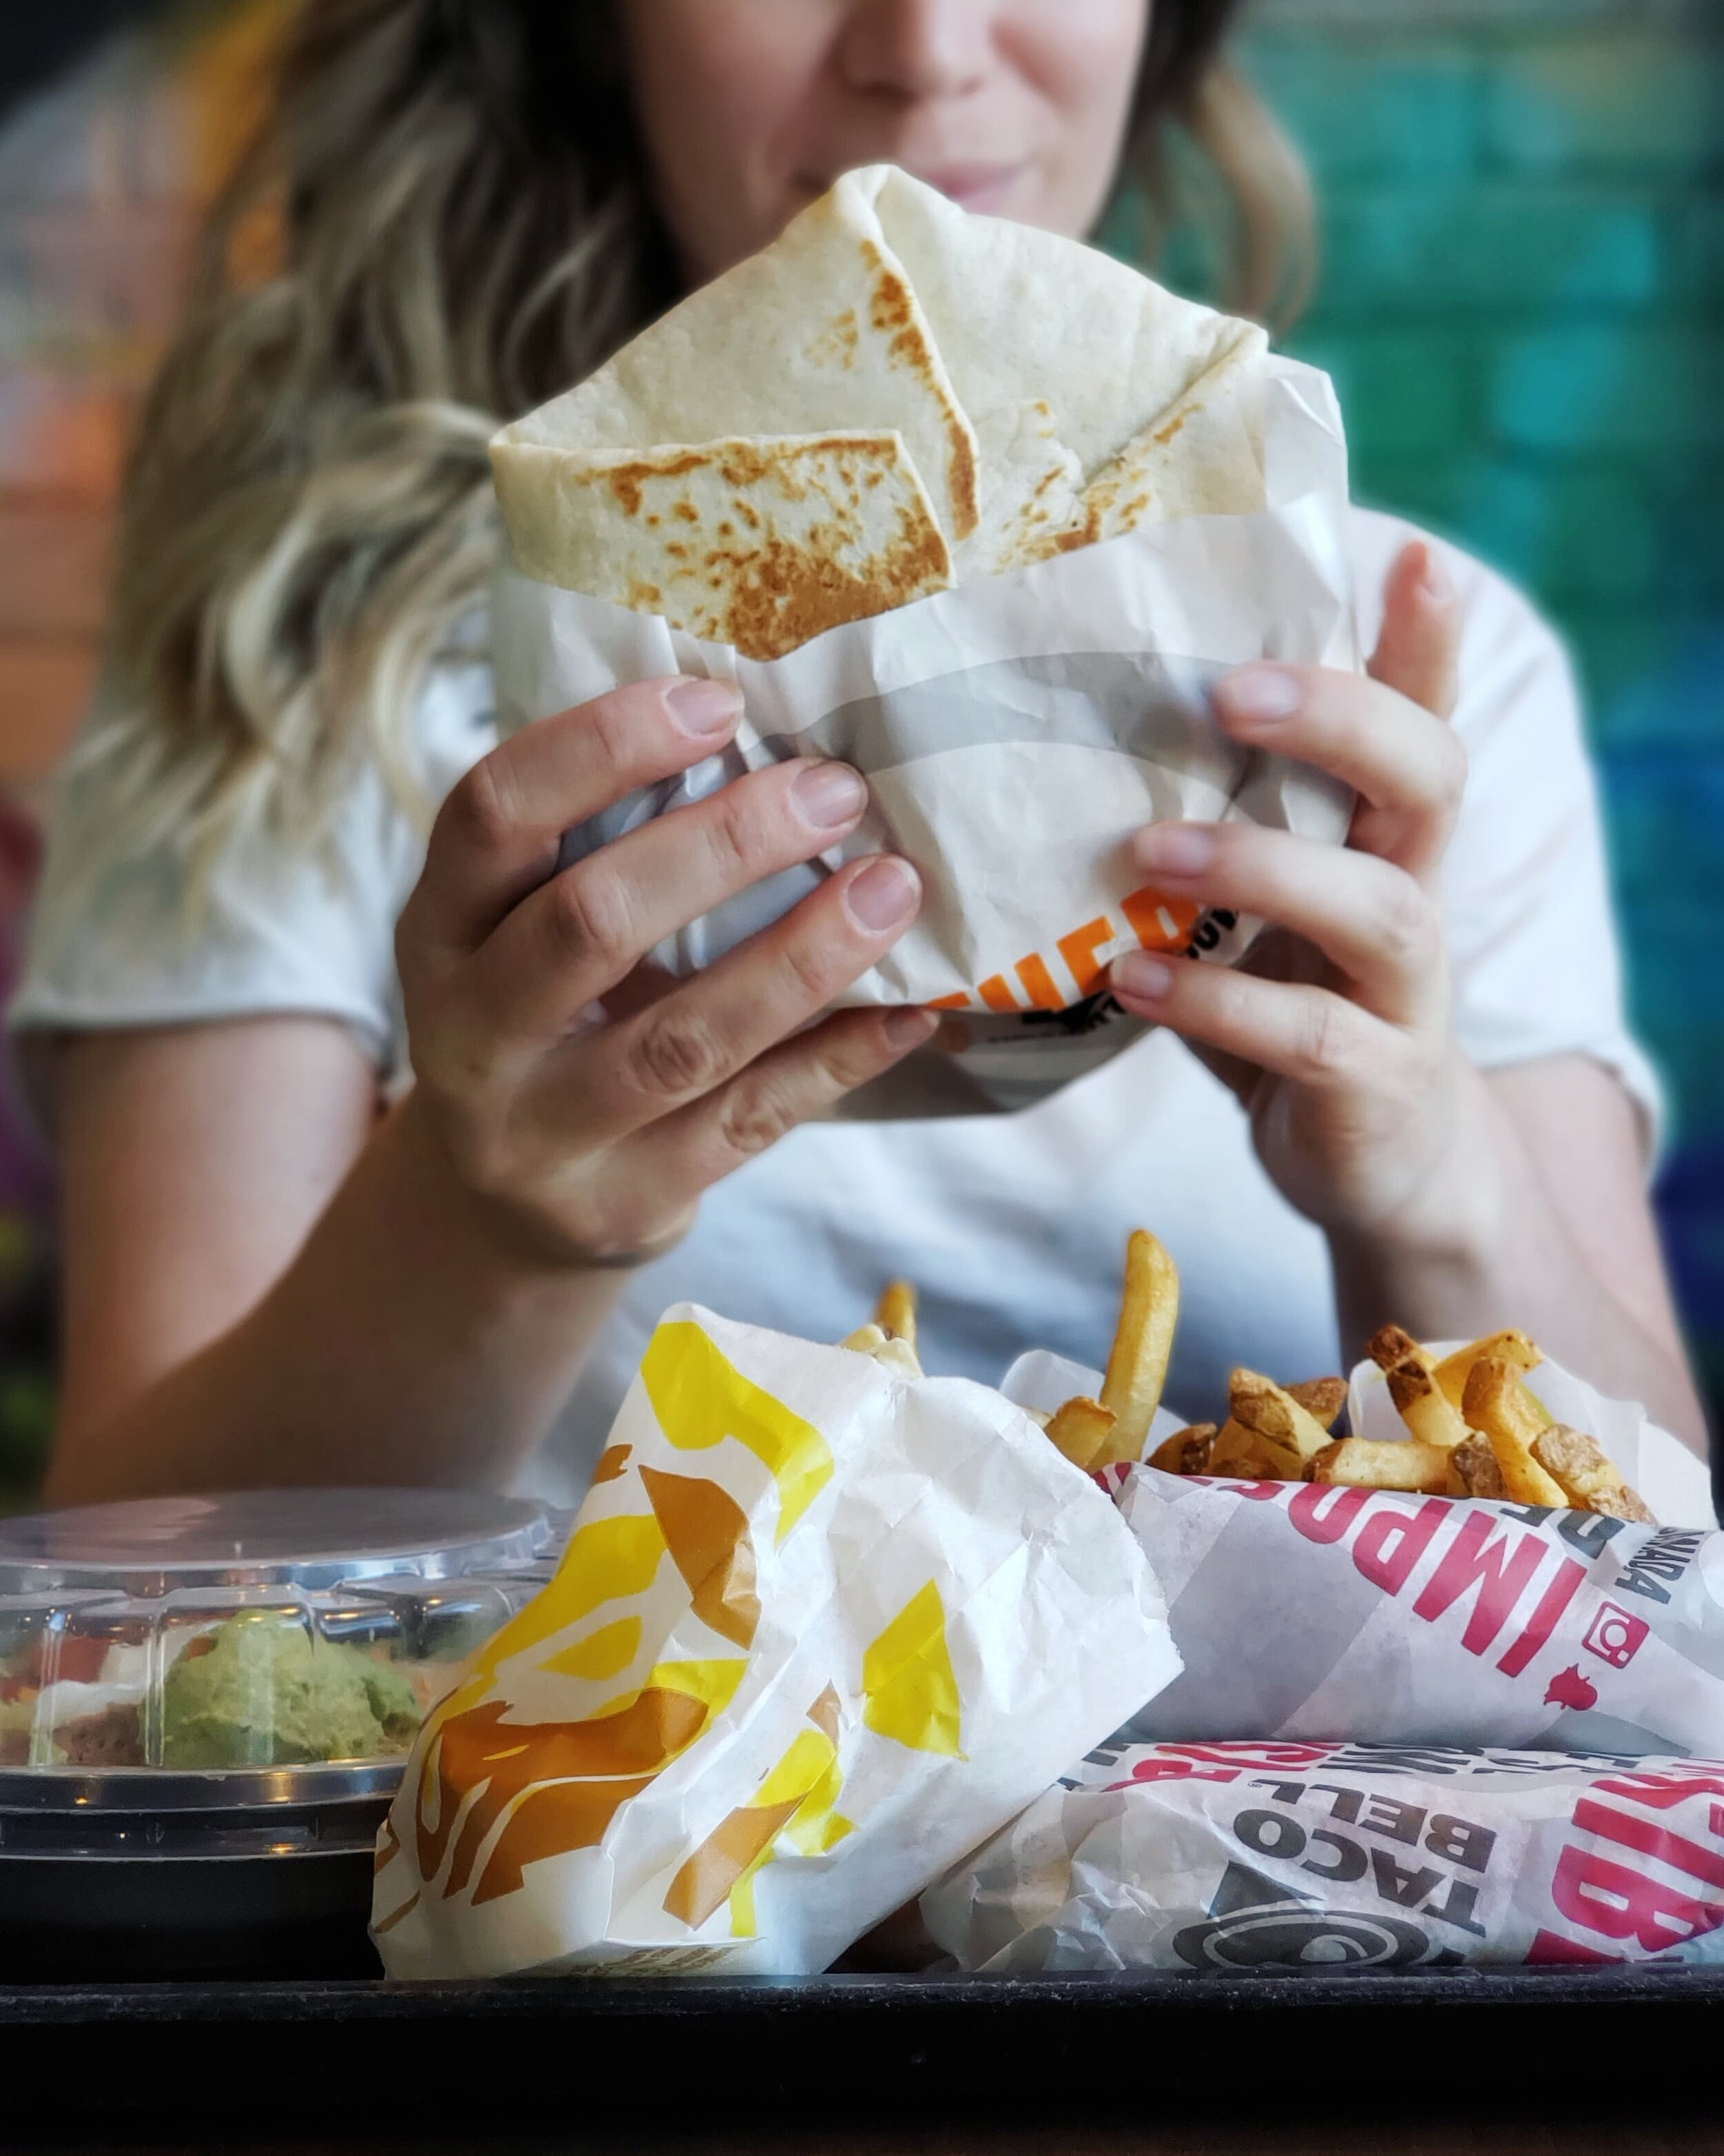 taco bell canada vegetarian crunchwrap supreme.jpg